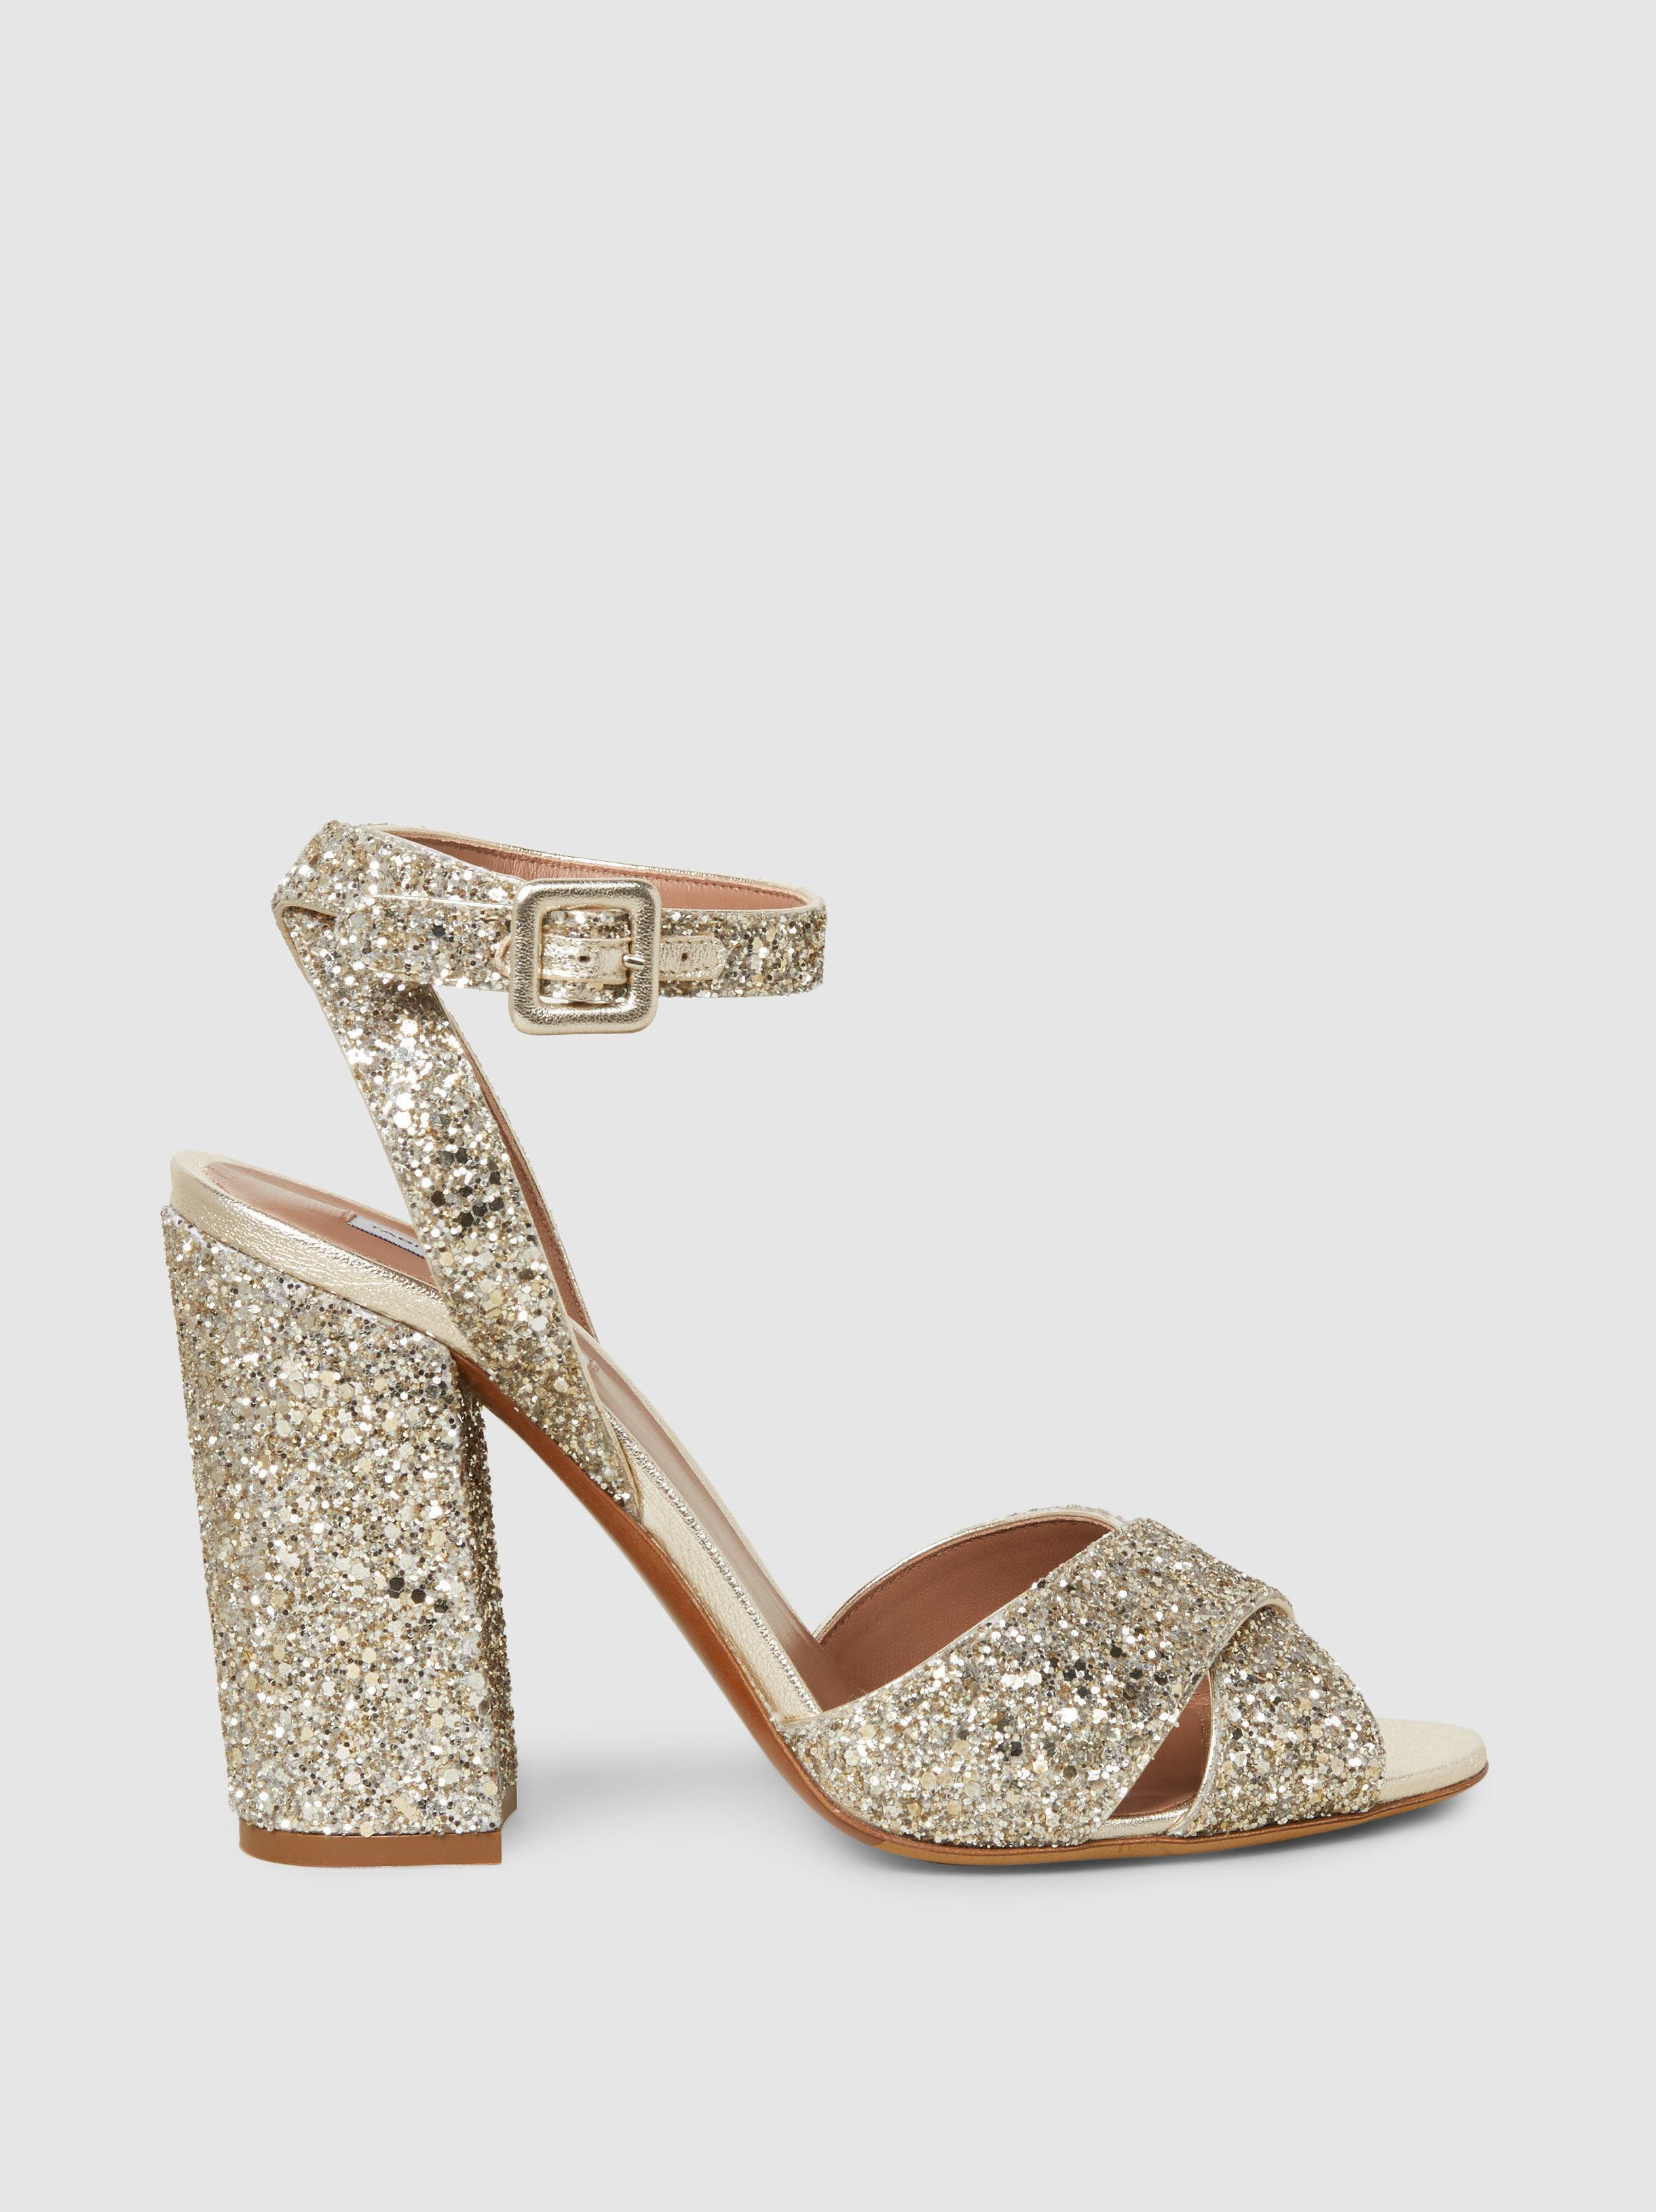 Tabitha Simmons Connie Glitter Sandals fi5Rezu